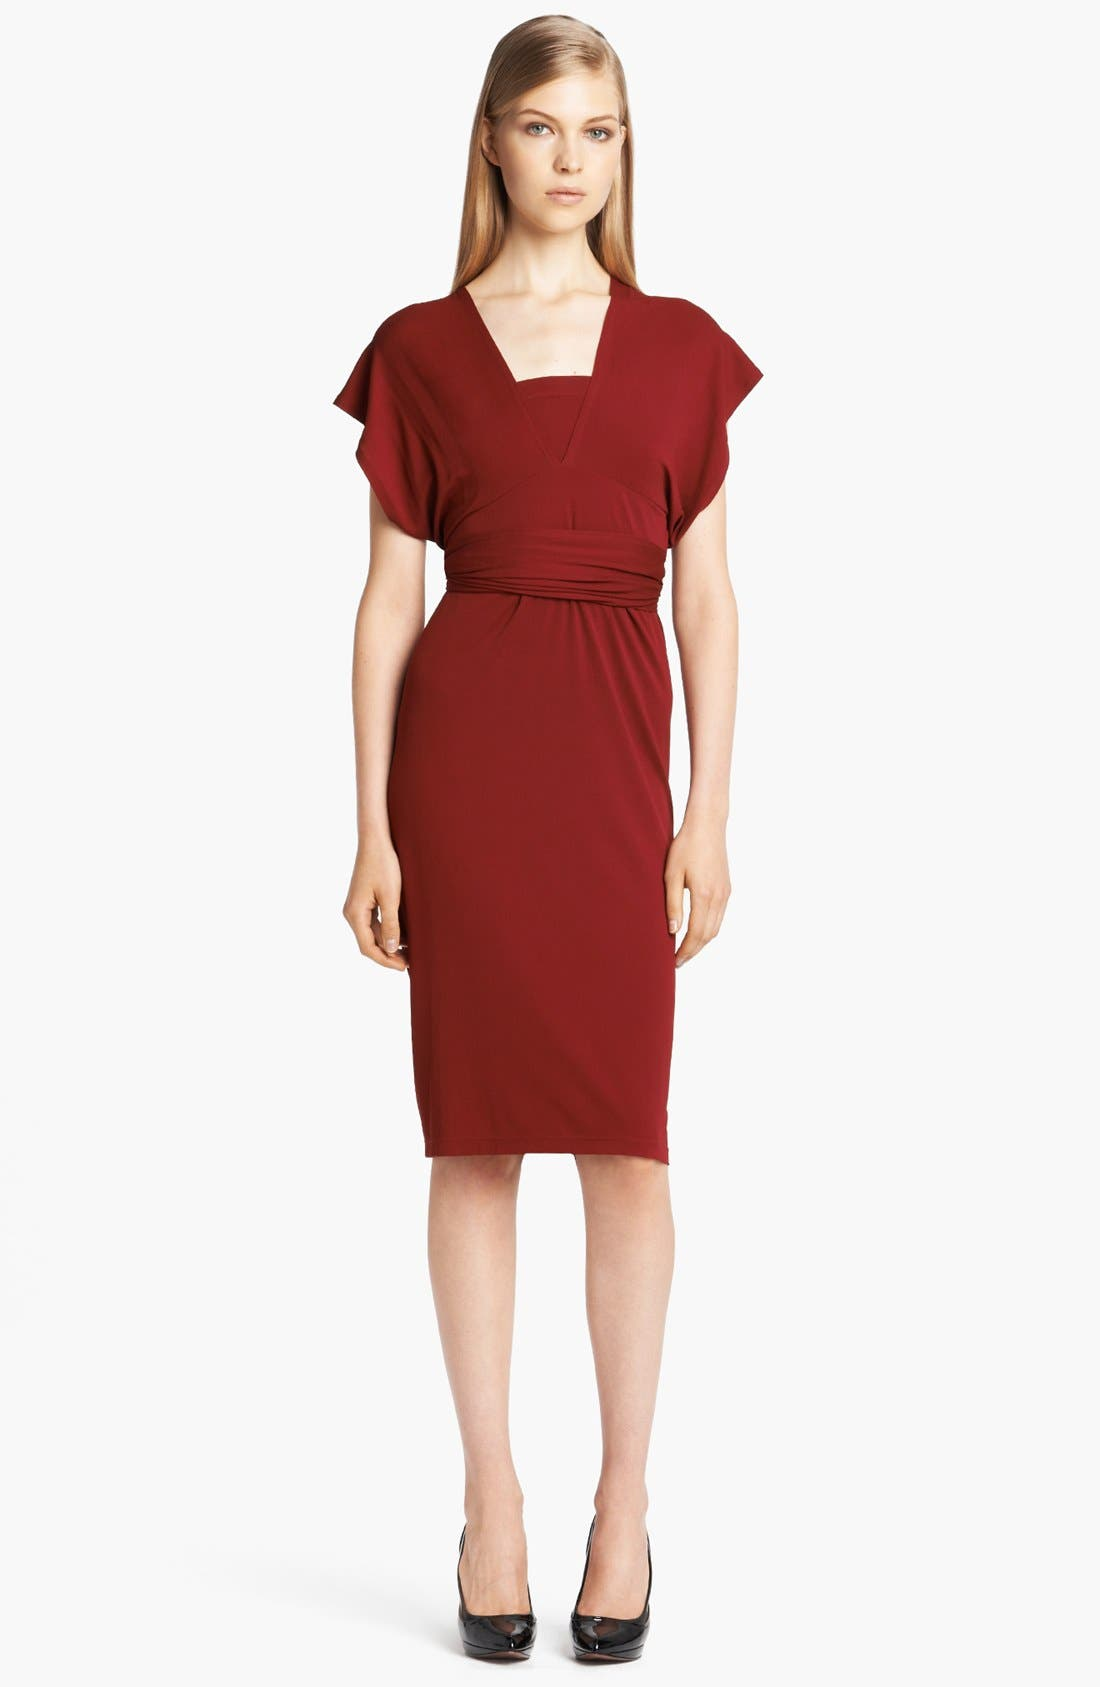 Alternate Image 1 Selected - Donna Karan 'Infinity' Matte Jersey Dress